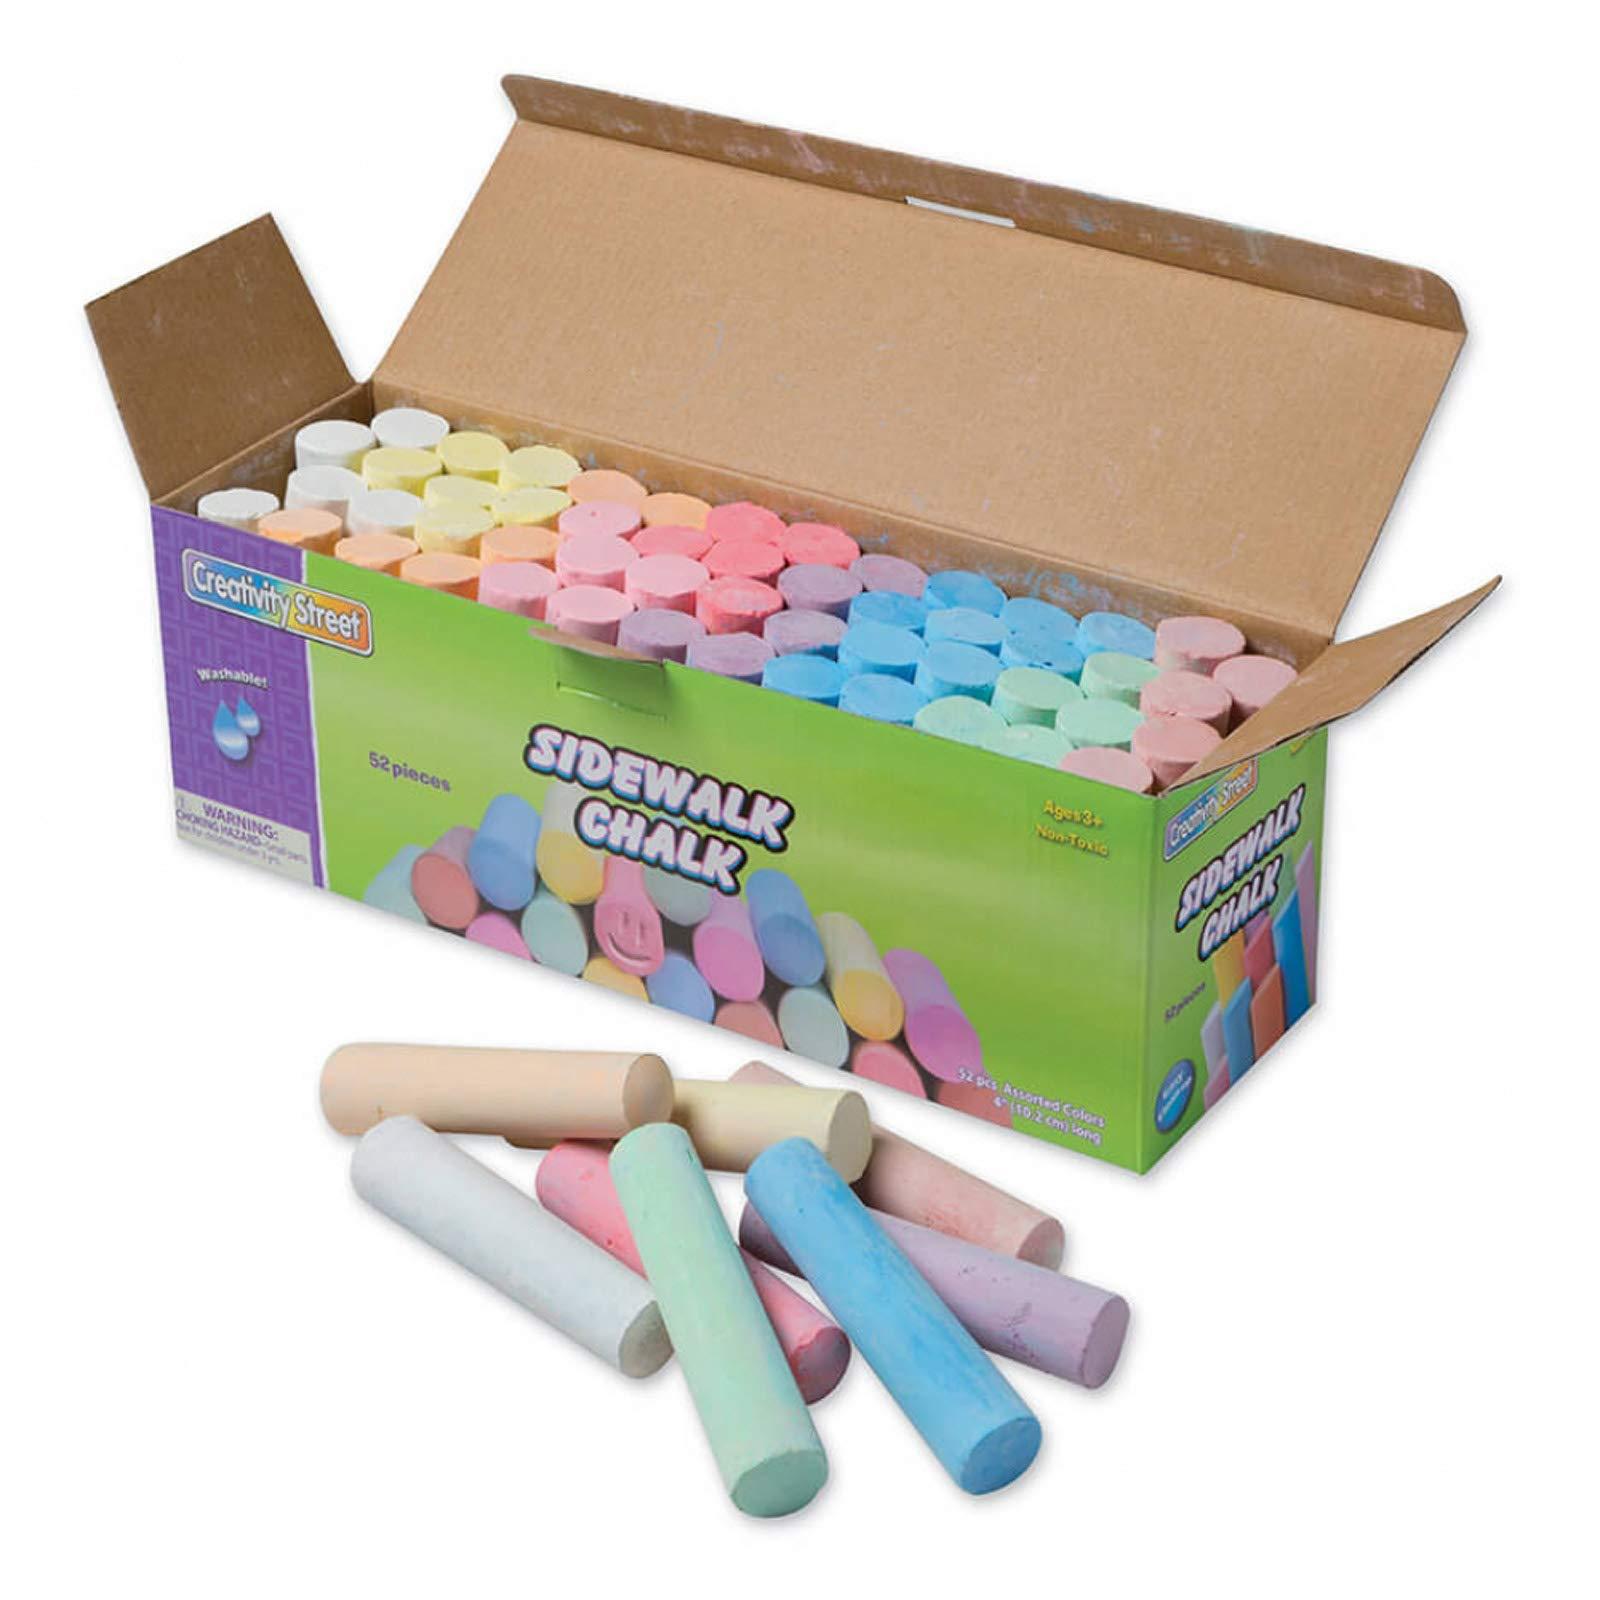 Creativity Street PACAC1752BN Sidewalk Chalk, Assorted Colors, 4'', 52 Pieces Per Pack, 3 Packs by Creativity Street